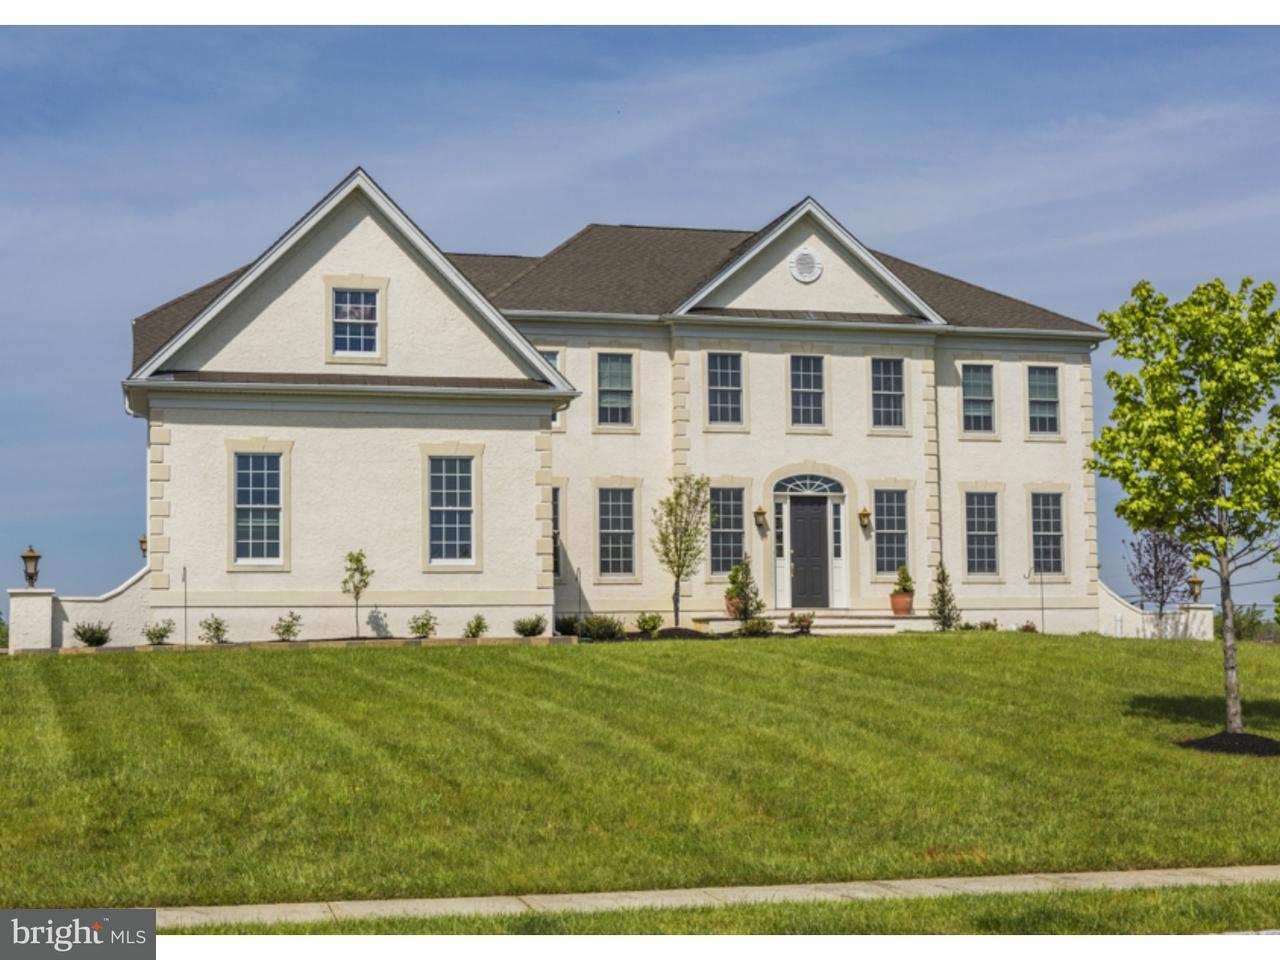 独户住宅 为 销售 在 2 ORCHARD Drive Cream Ridge, 新泽西州 08514 美国在/周边: Upper Freehold Township